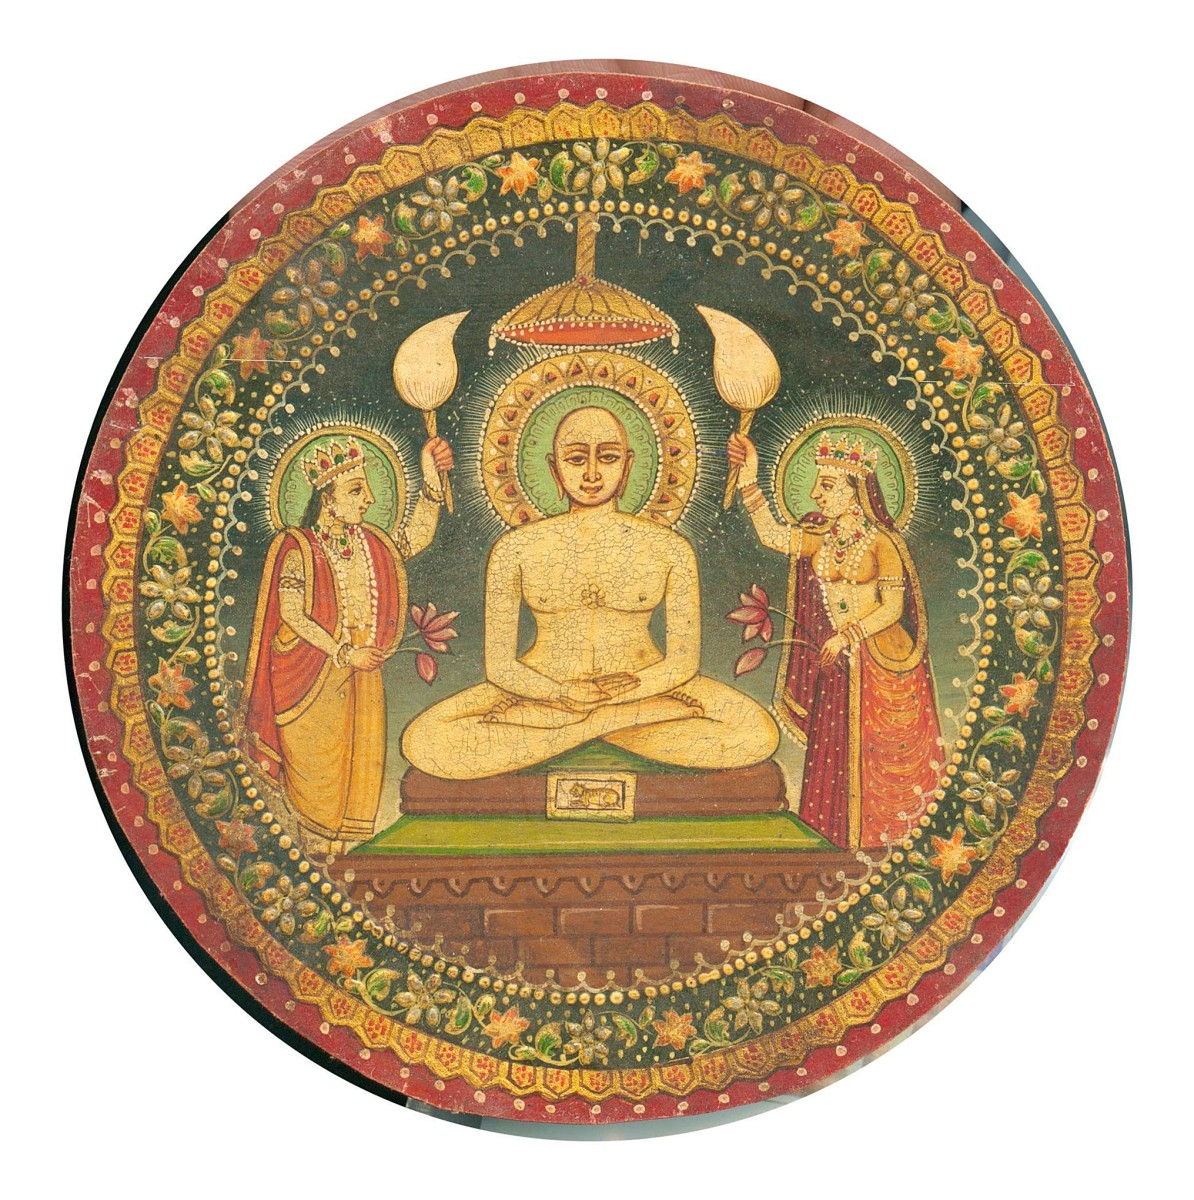 Miniature Paintings in Jain Manuscripts | HubPages